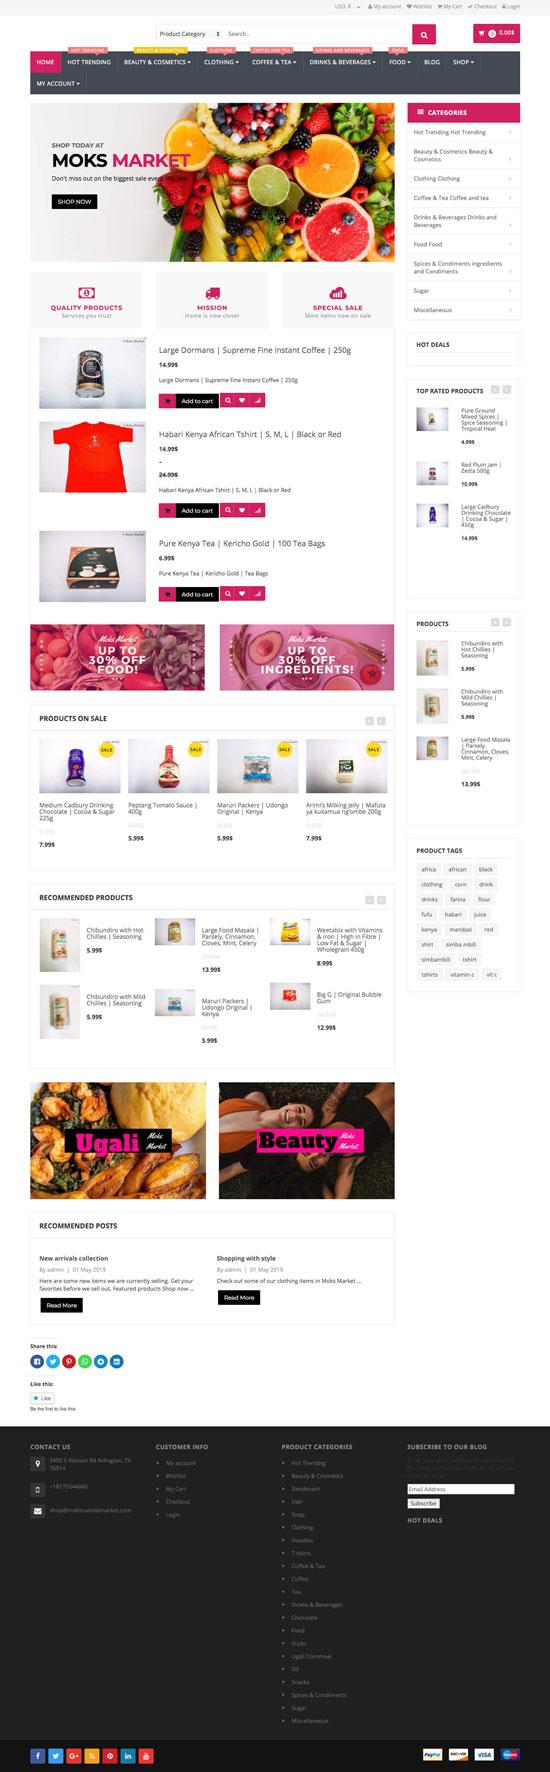 Moks Market website screenshot